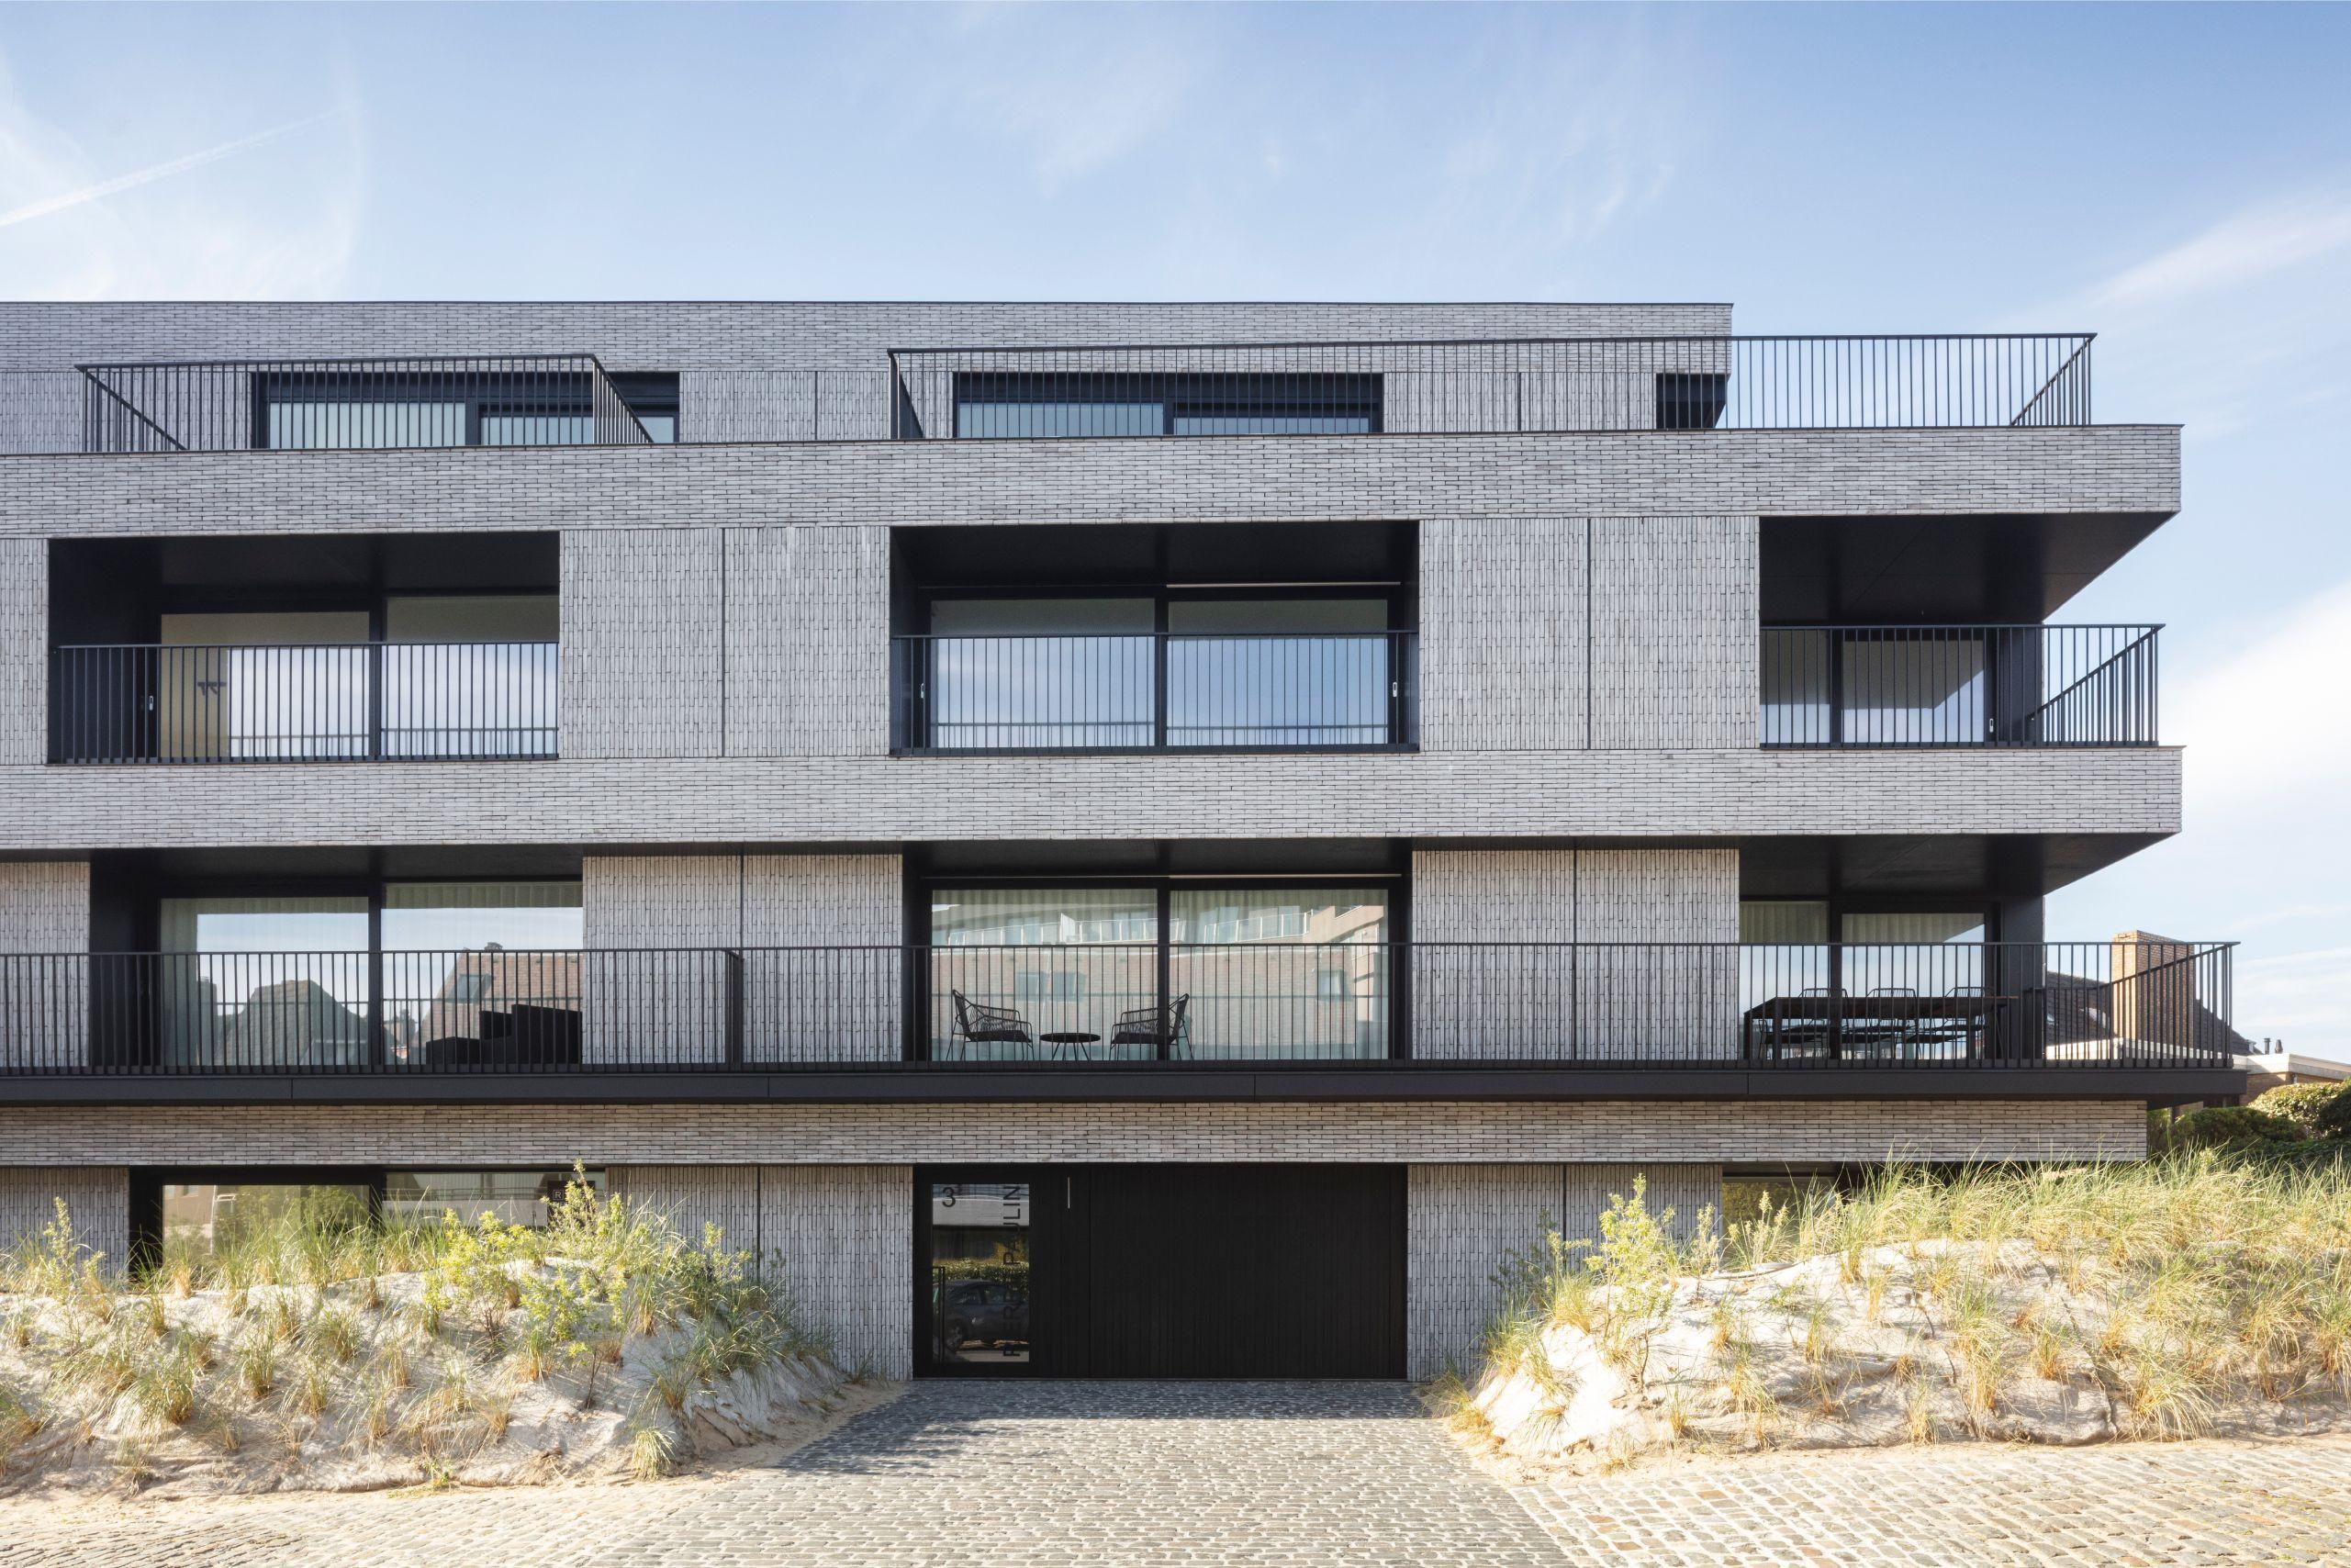 Pierre Paulin - Rietveldprojects - Sint-Idesbald - Tvdv3.jpg